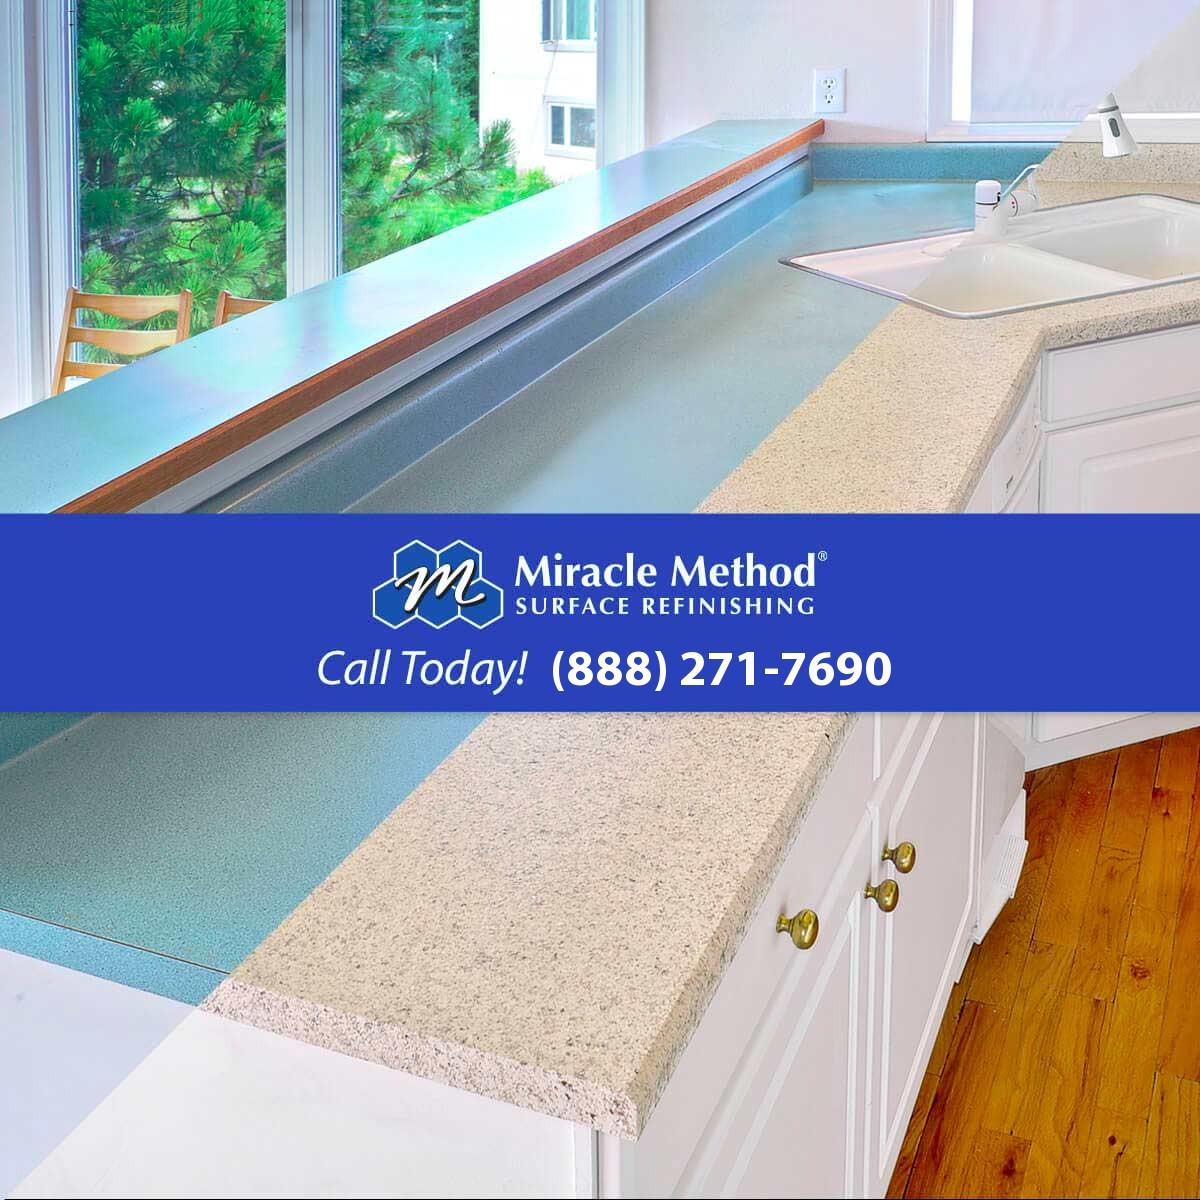 Glendale, AZ Surface Refinishing & Repair | Miracle Method of ...